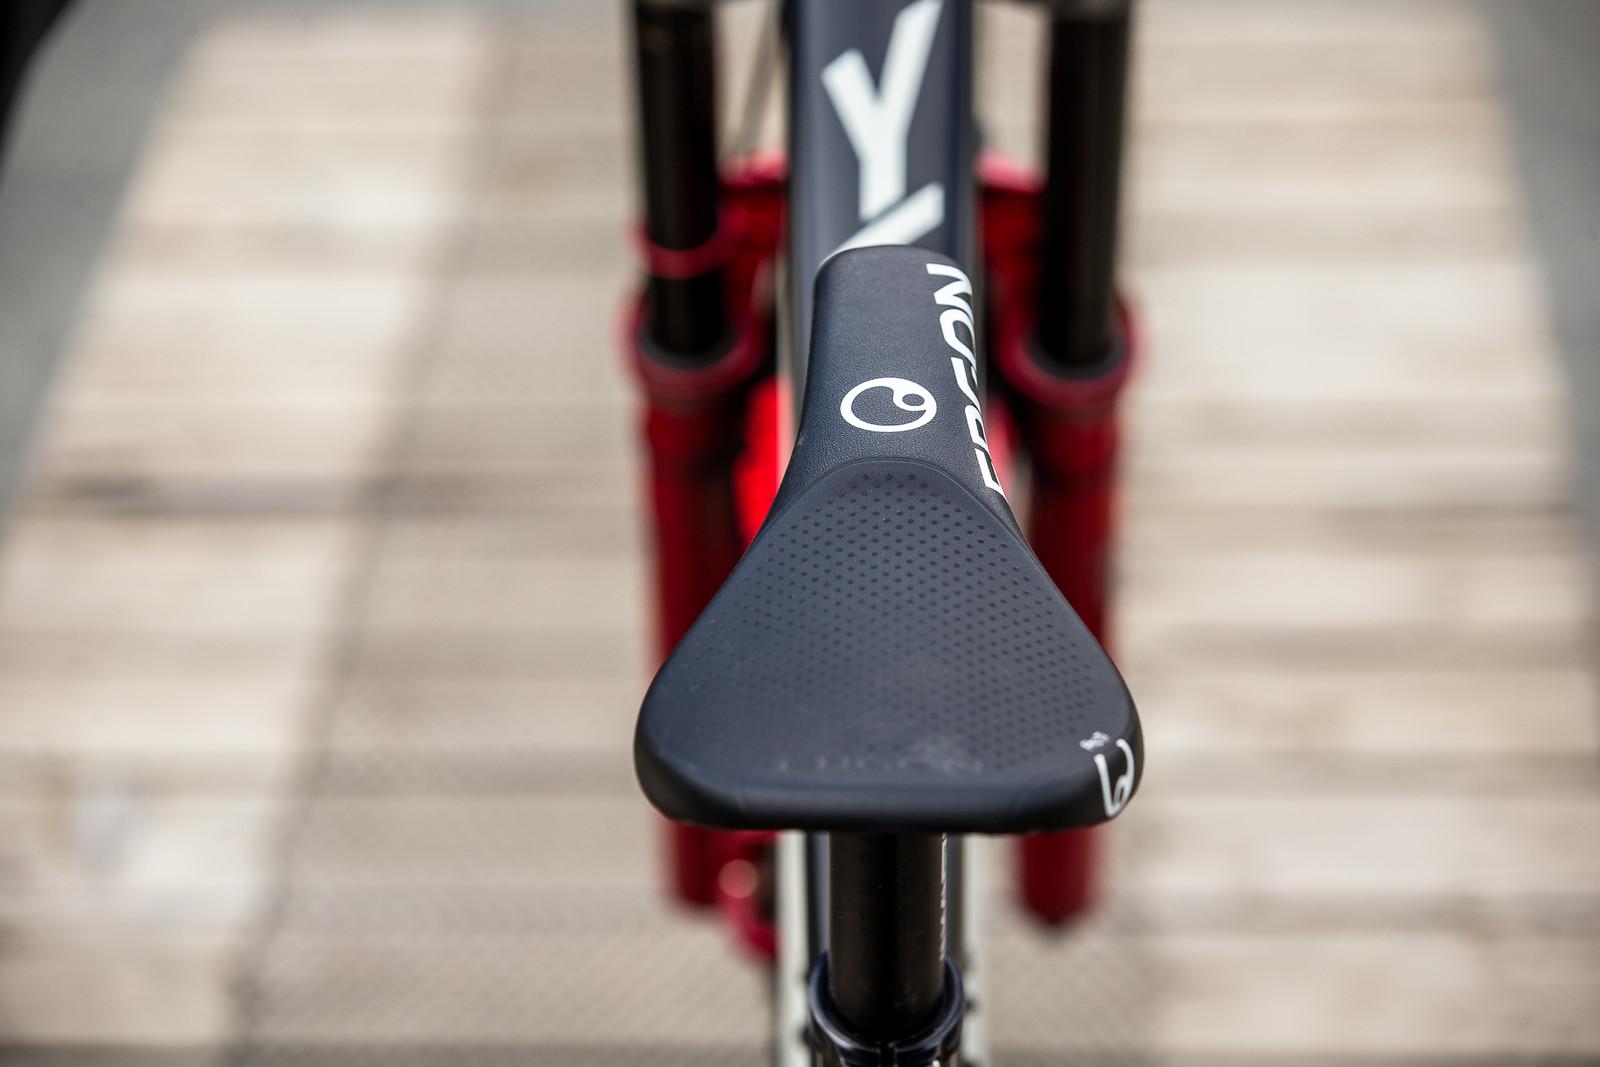 Ergon Saddle - WINNING BIKE - Vali Höll's YT TUES - Mountain Biking Pictures - Vital MTB